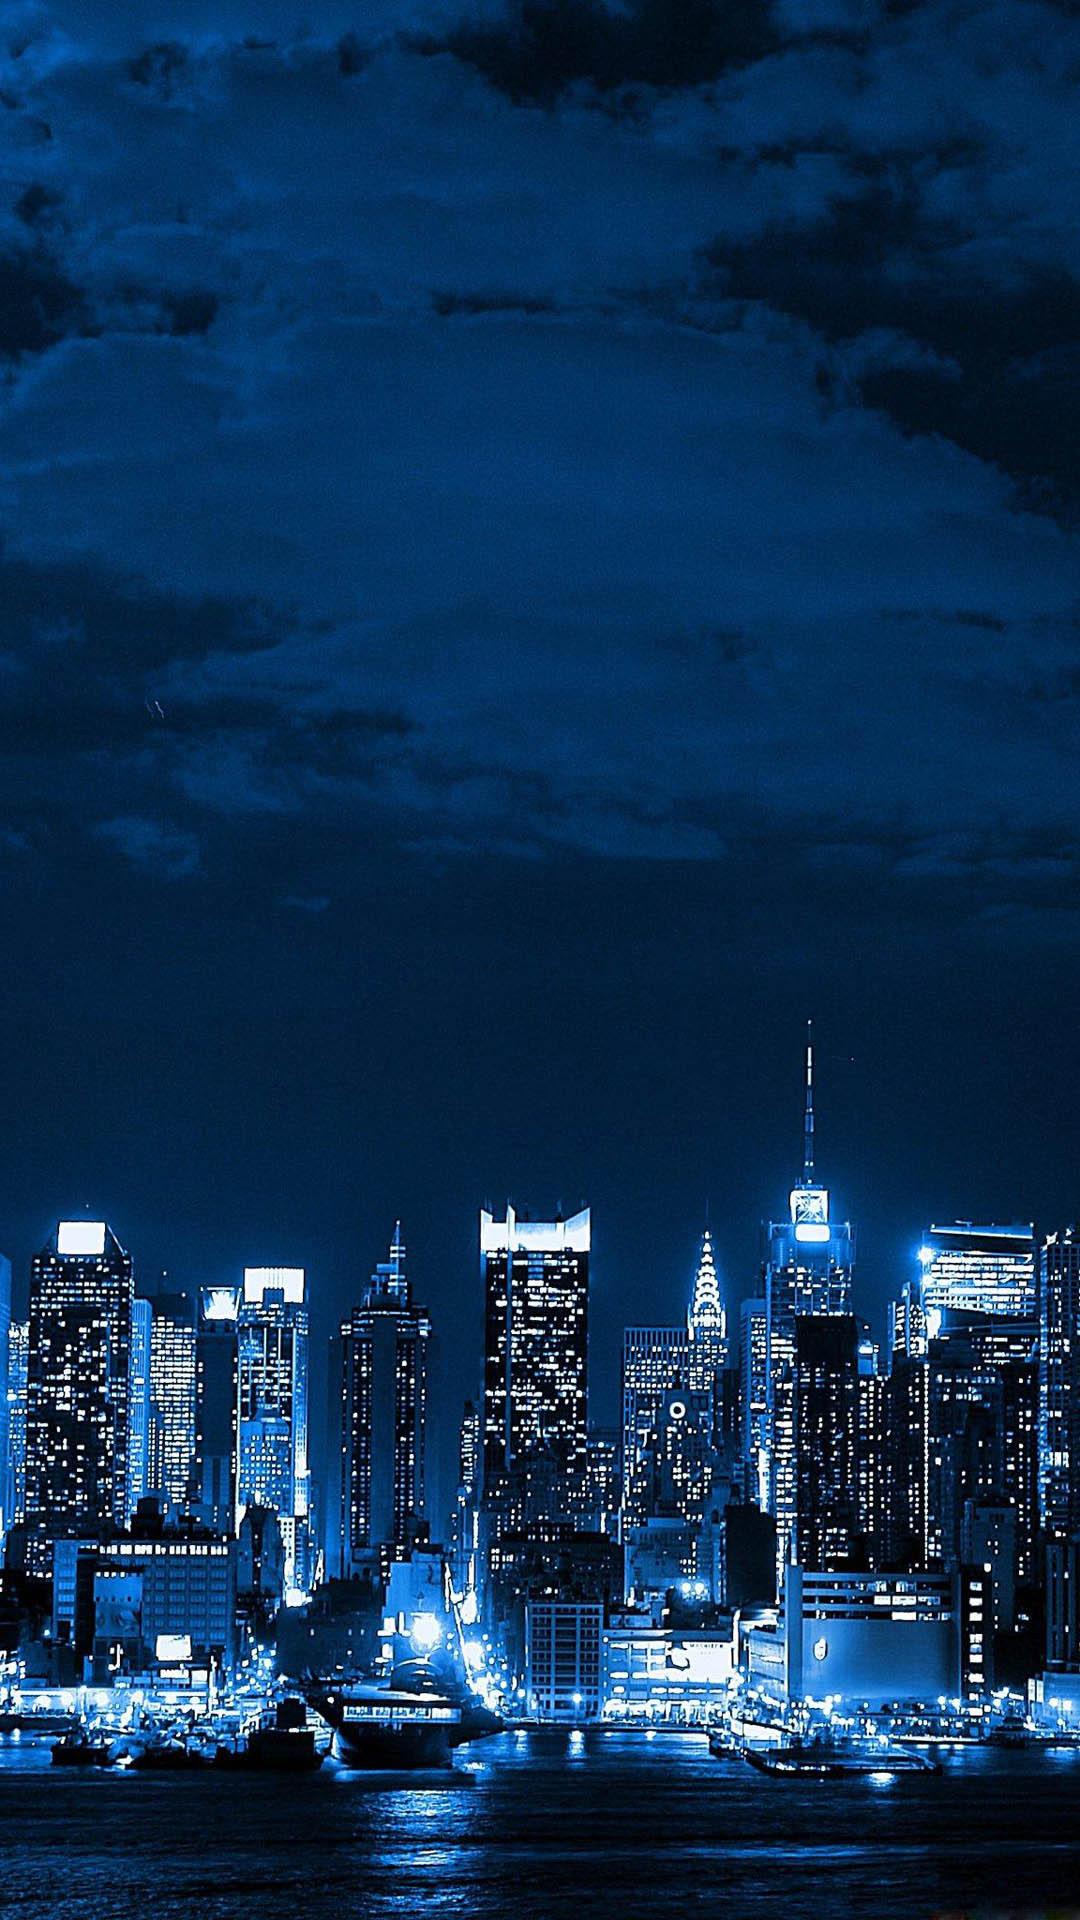 Breaking Bad Wallpaper Iphone X Metropolis Big City Night Skyline Best Htc One Wallpapers